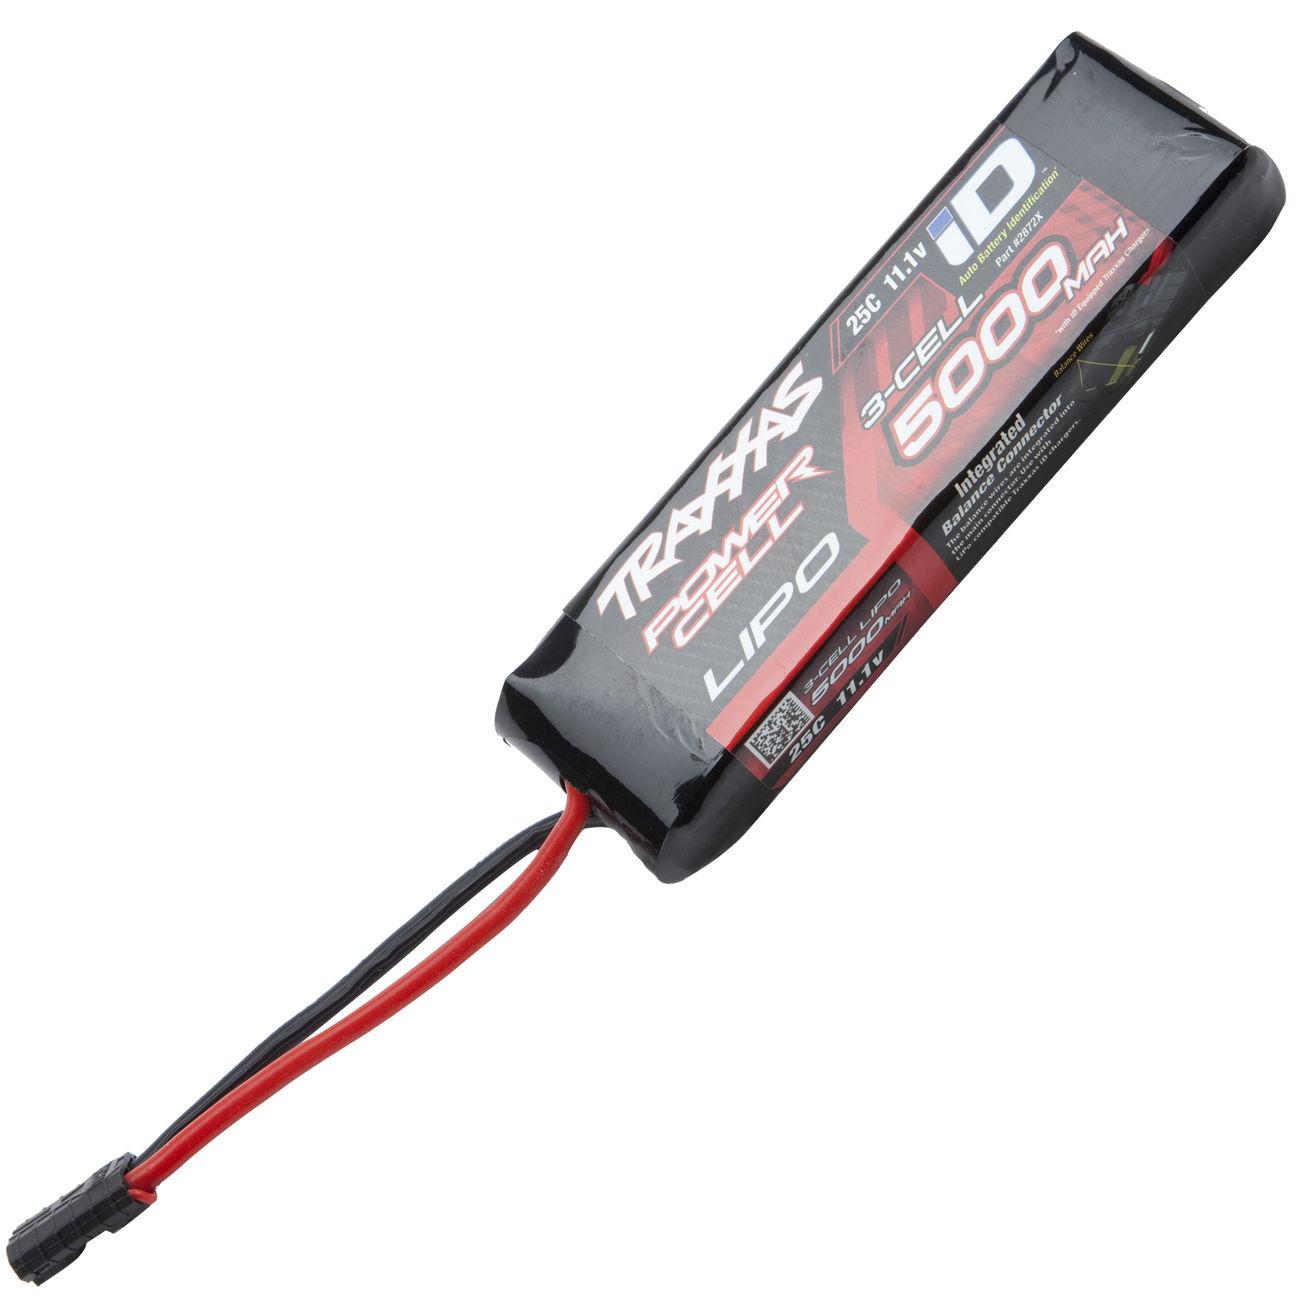 Traxxas power cell lipo akku 11 1v 5000mah 25c power pack for Lipo schreibtisch